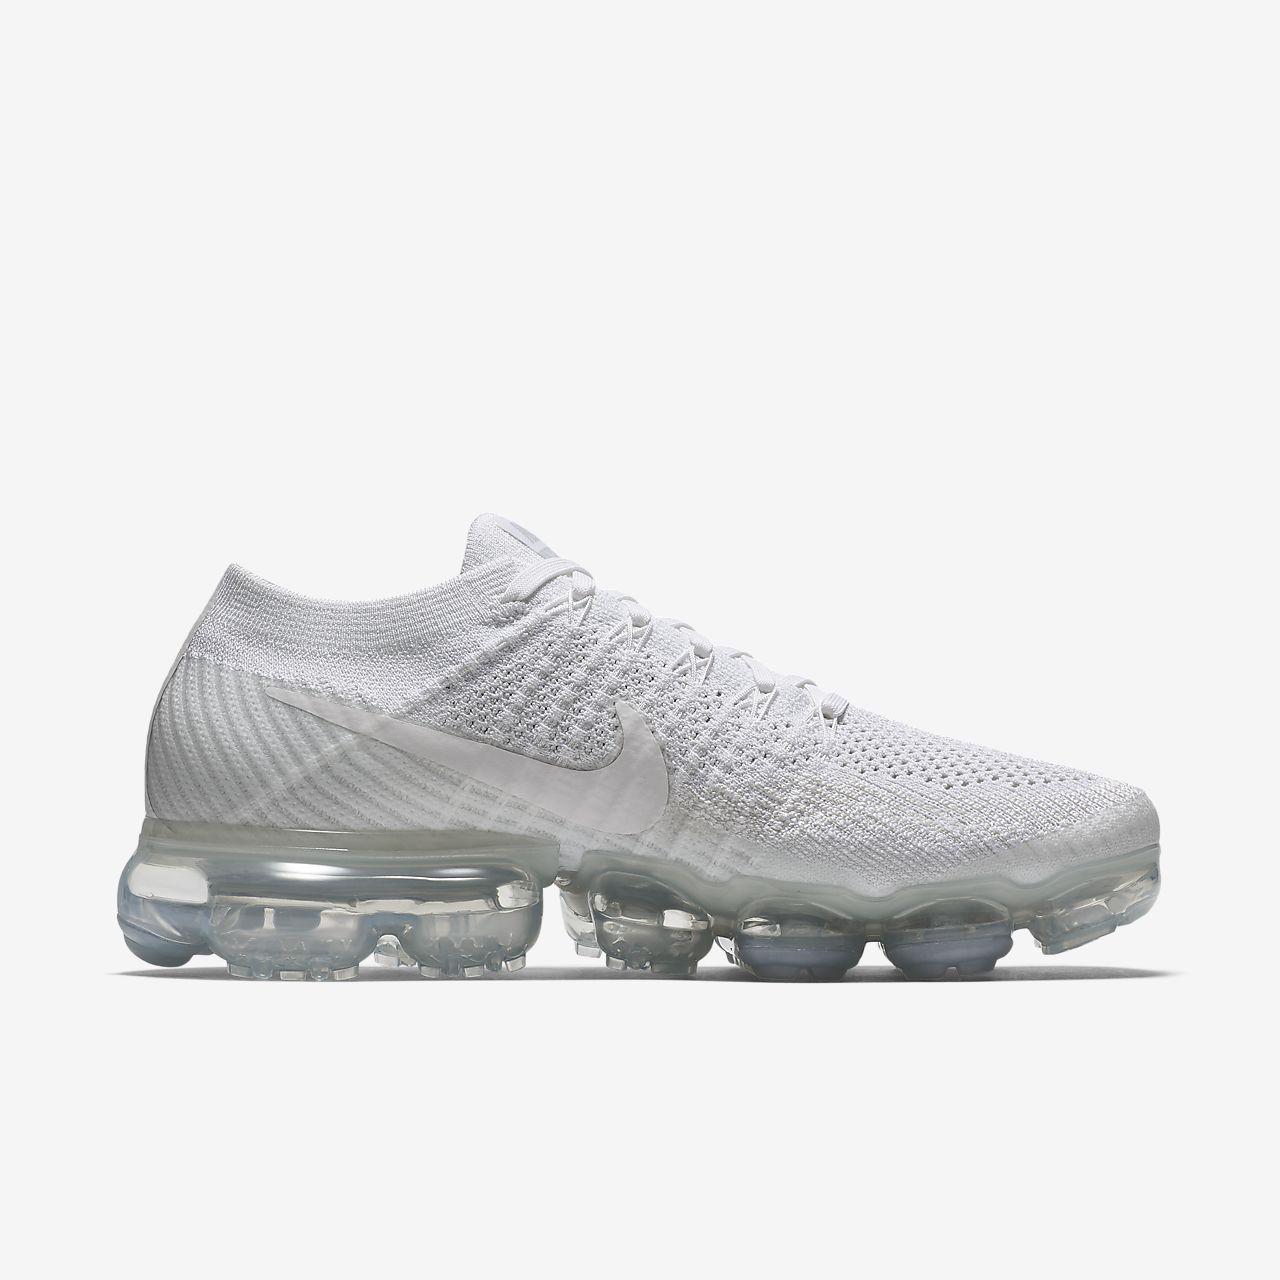 sale retailer 15a54 597f1 ... nike air vapormax flyknit womens running shoe